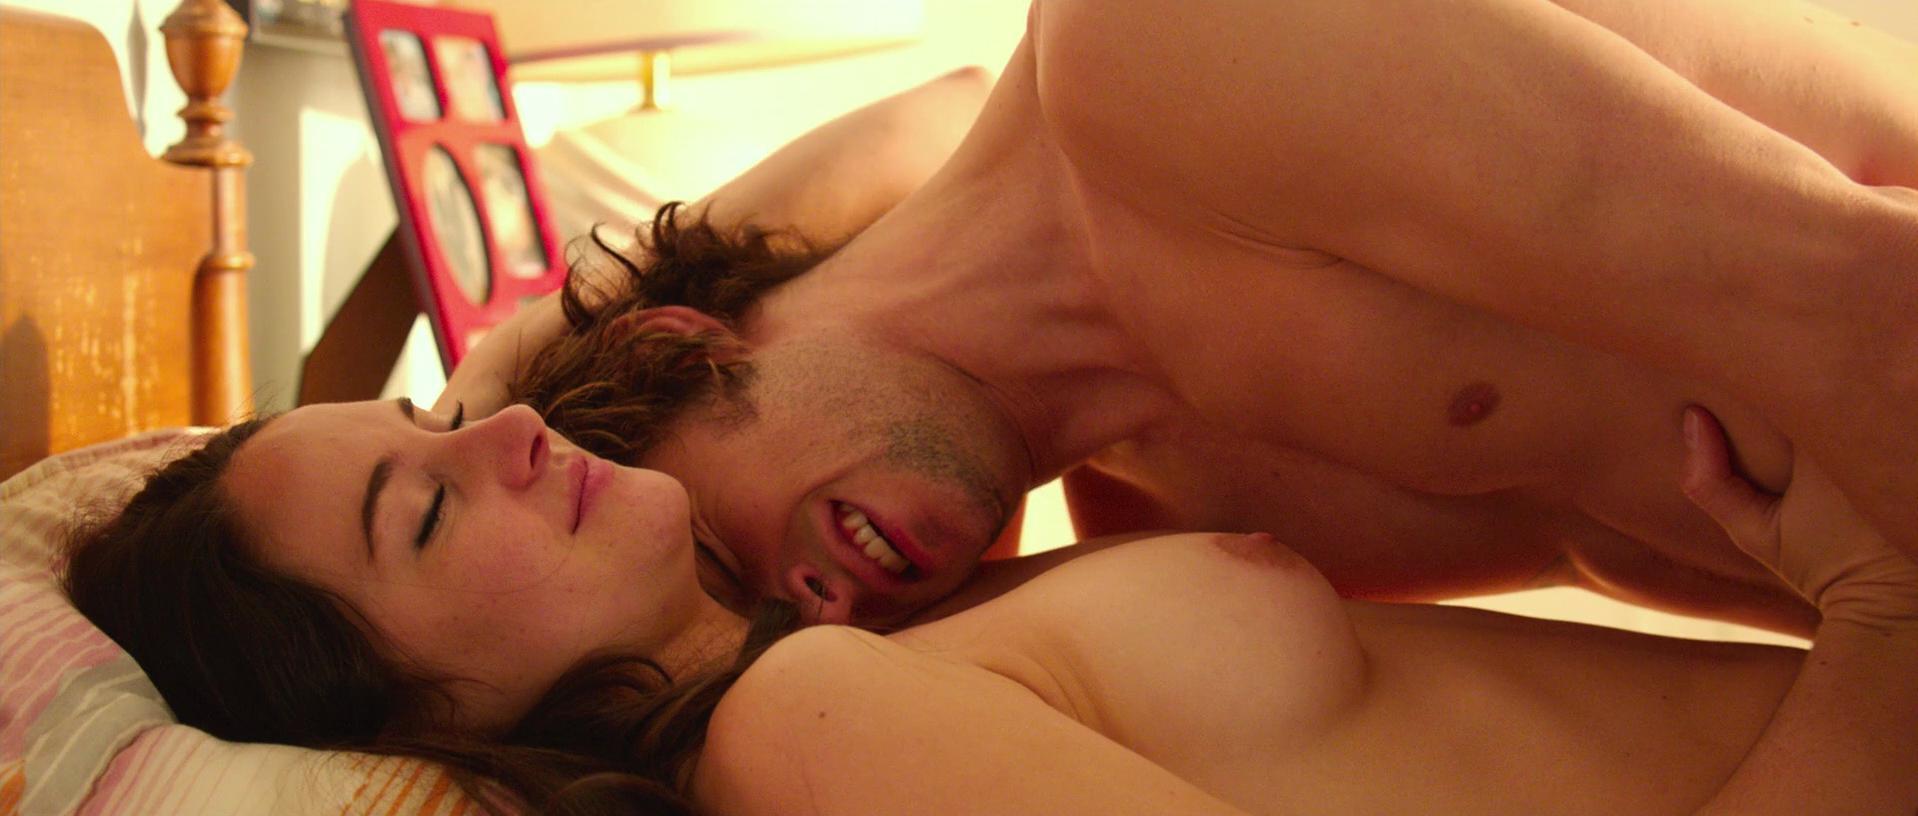 erotic videos and pics